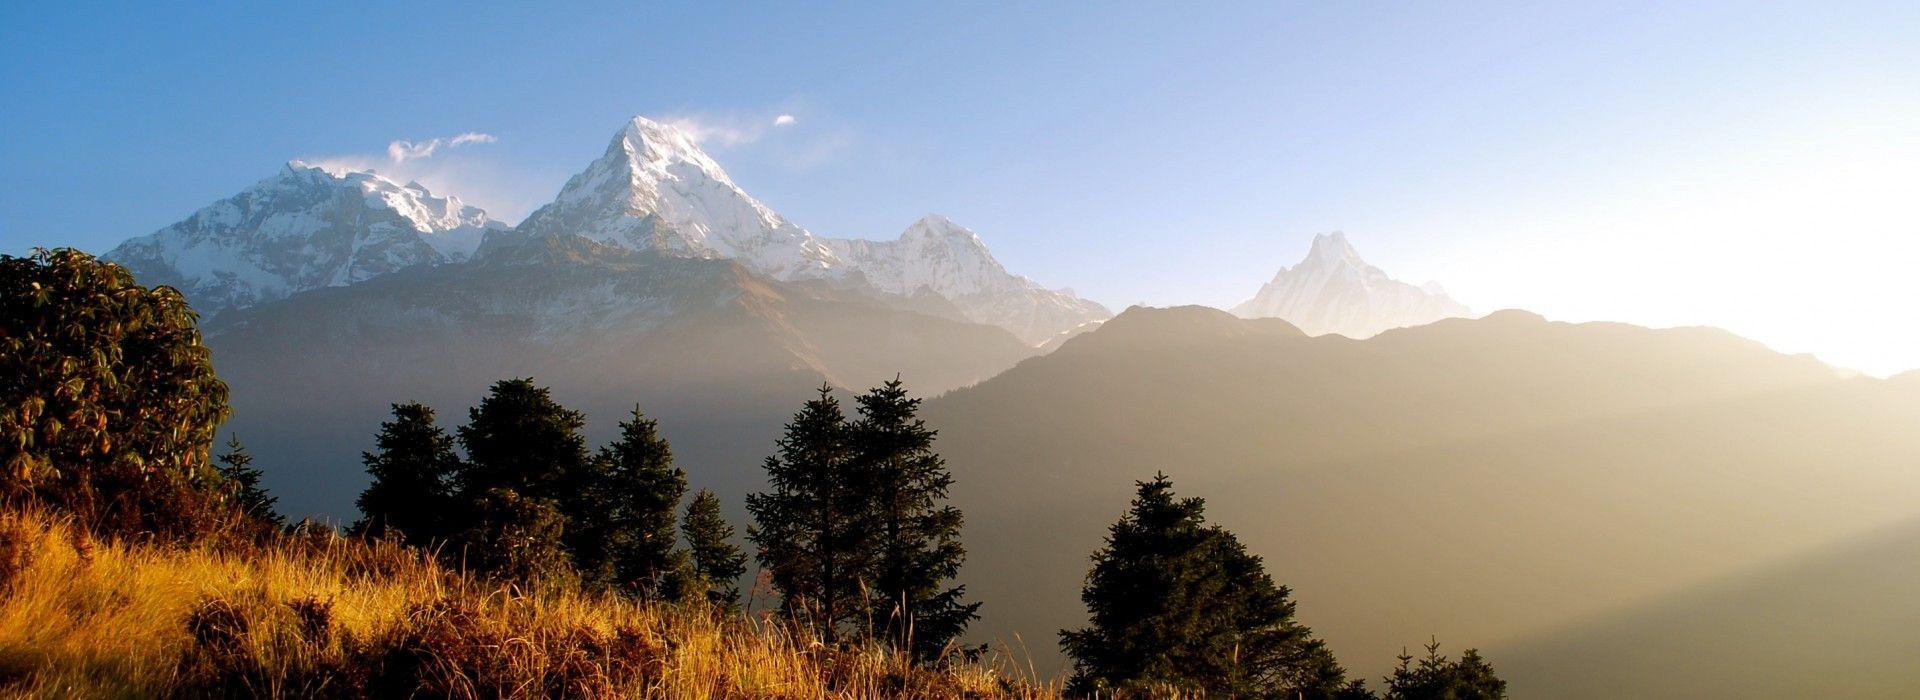 Climbing Tours in Everest Base Camp trek